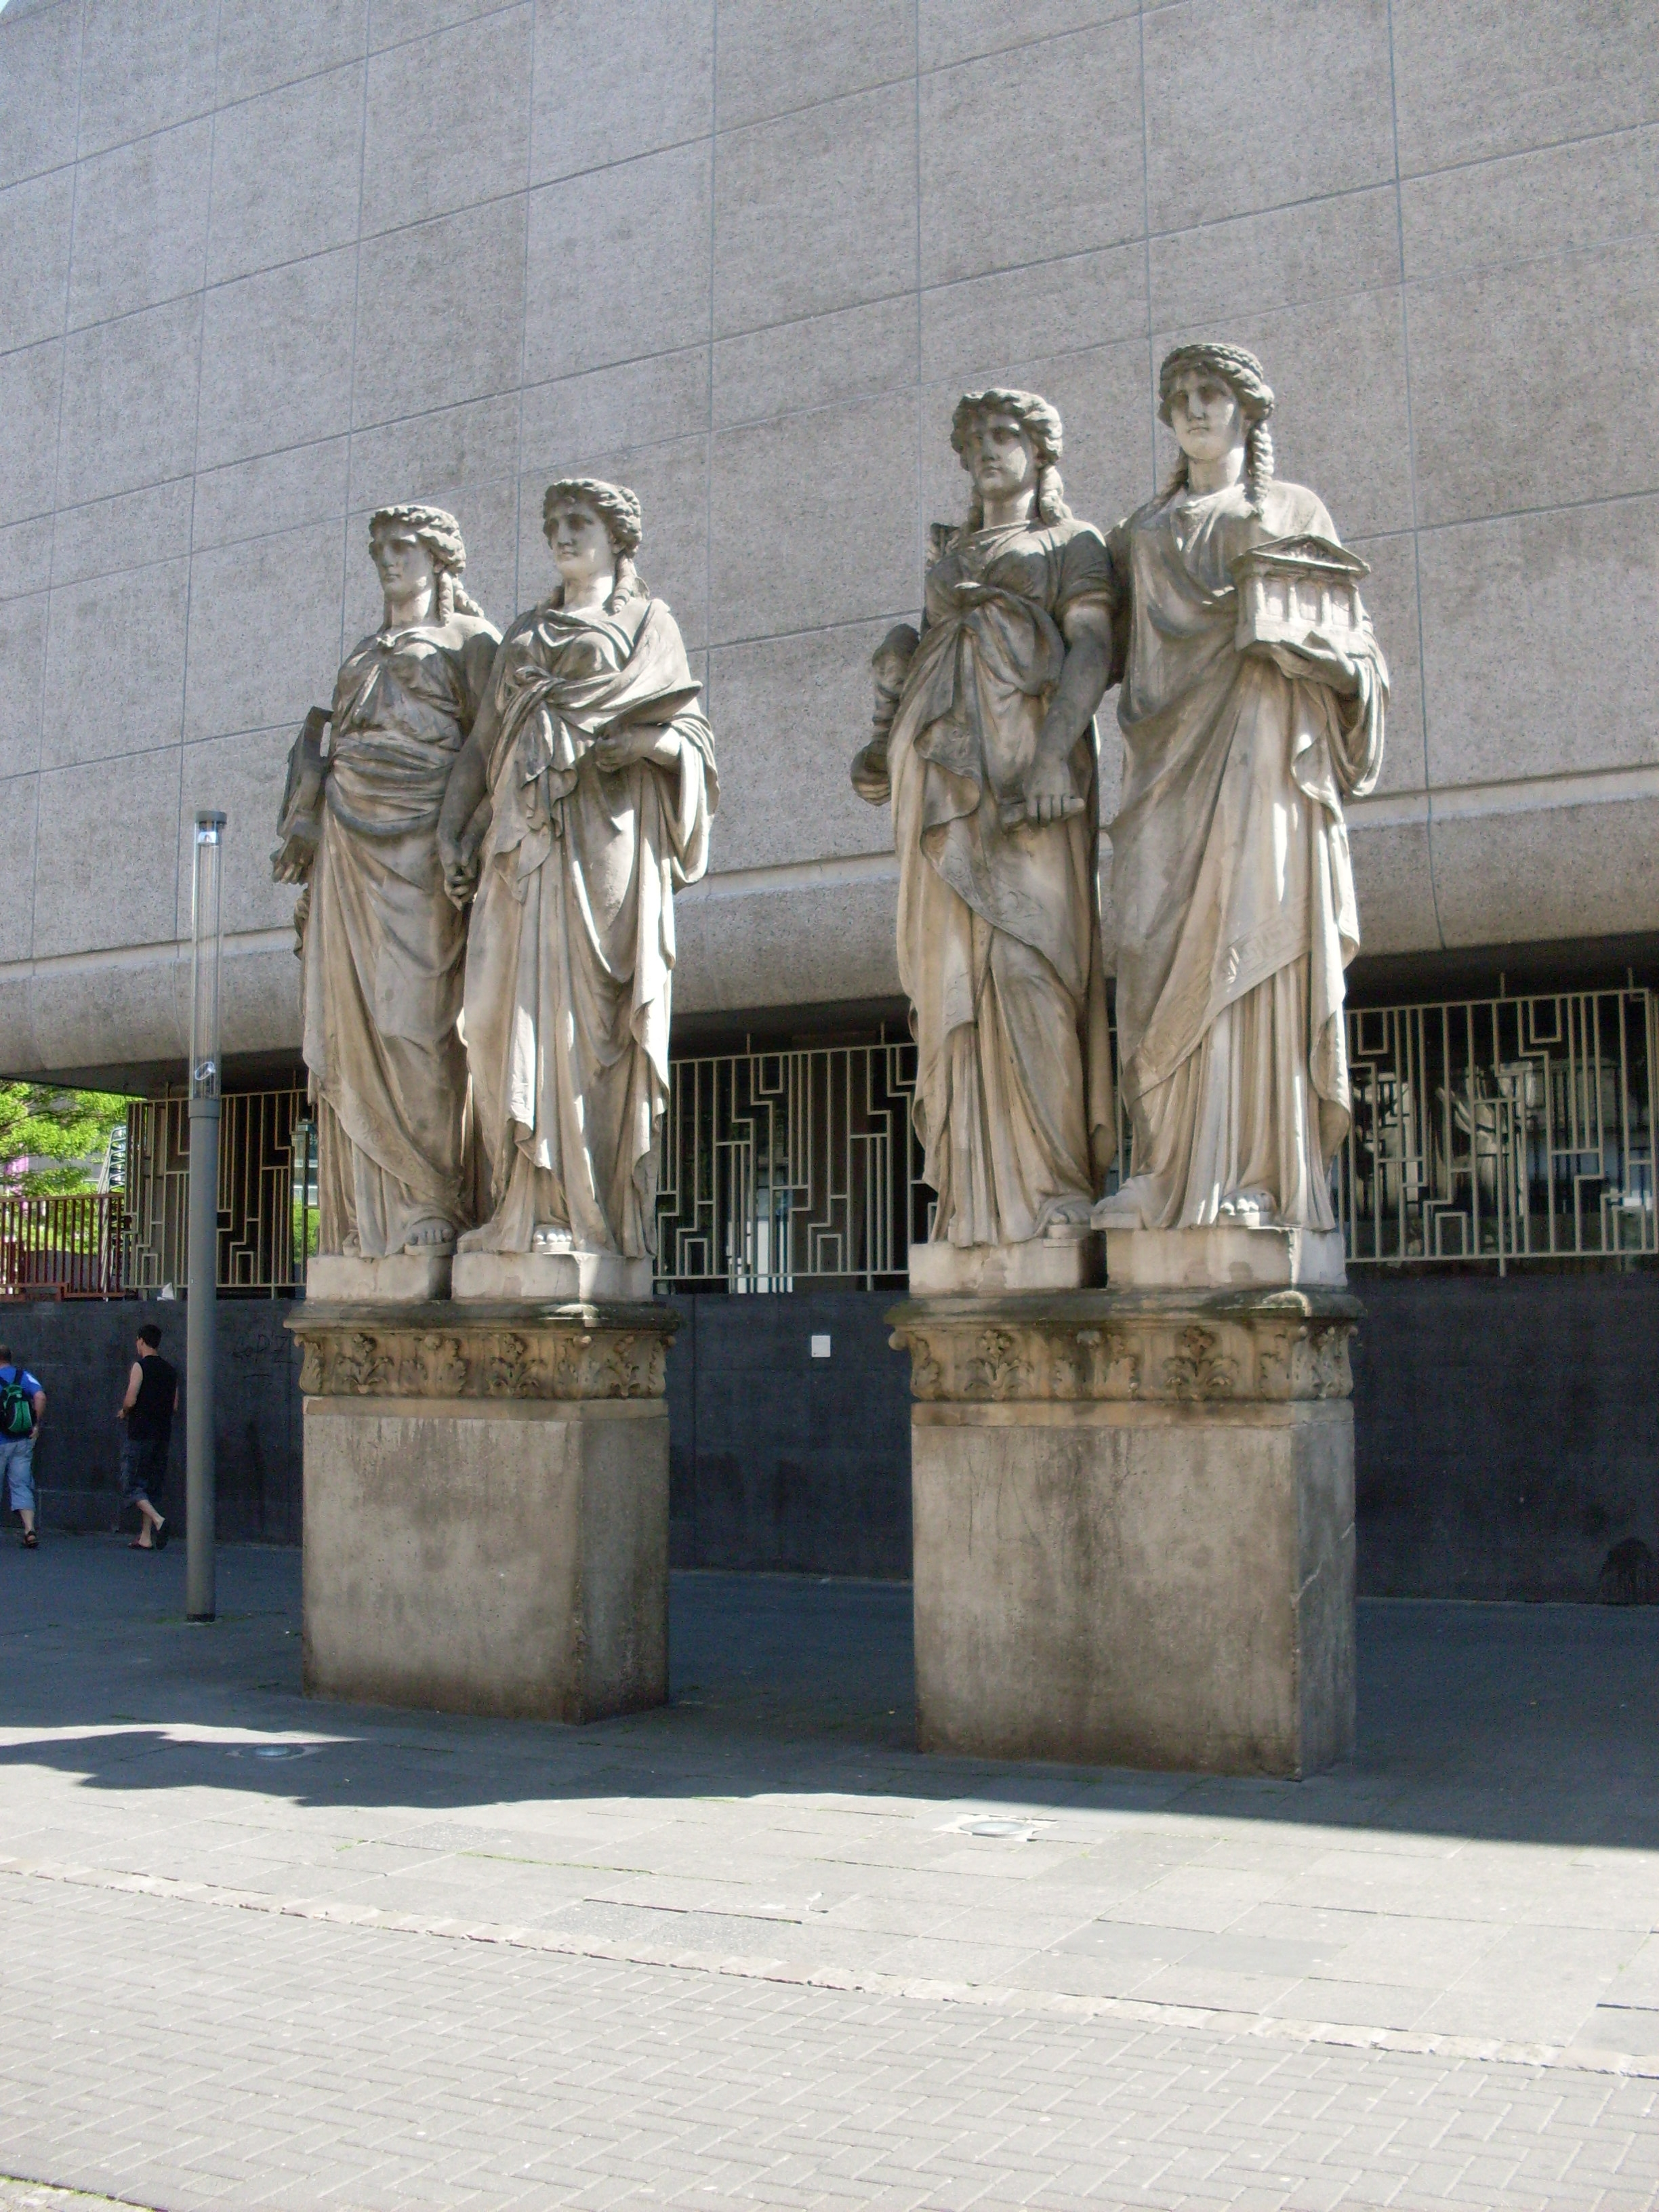 Kunsthalle Dusseldorf Wikipedia